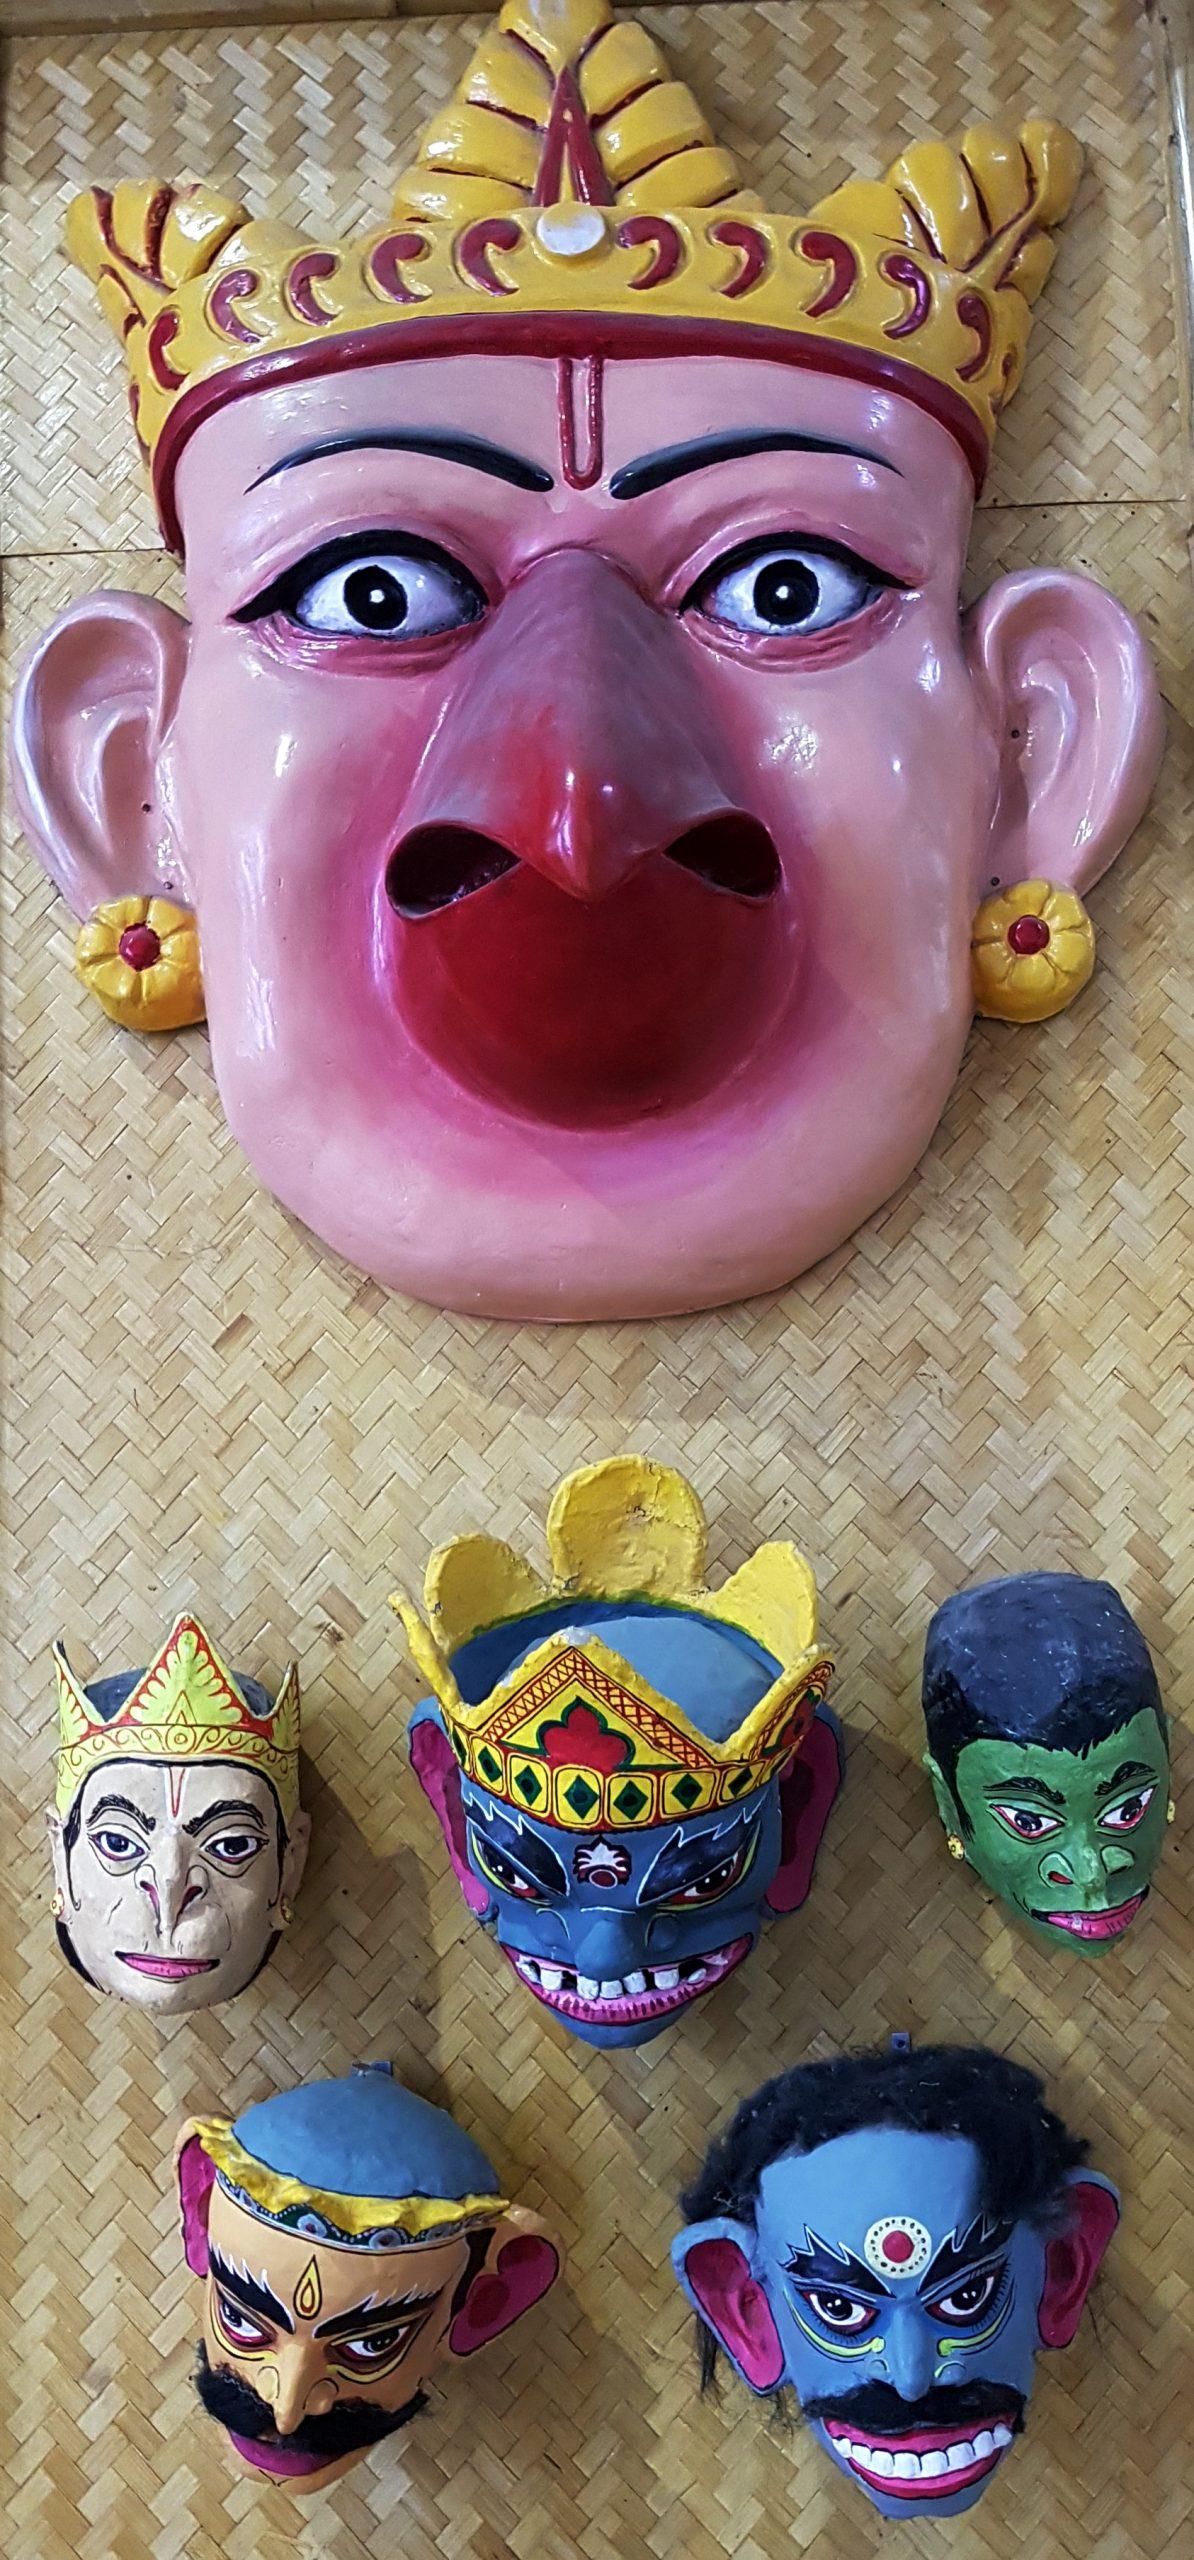 Ceramic Pottery Items